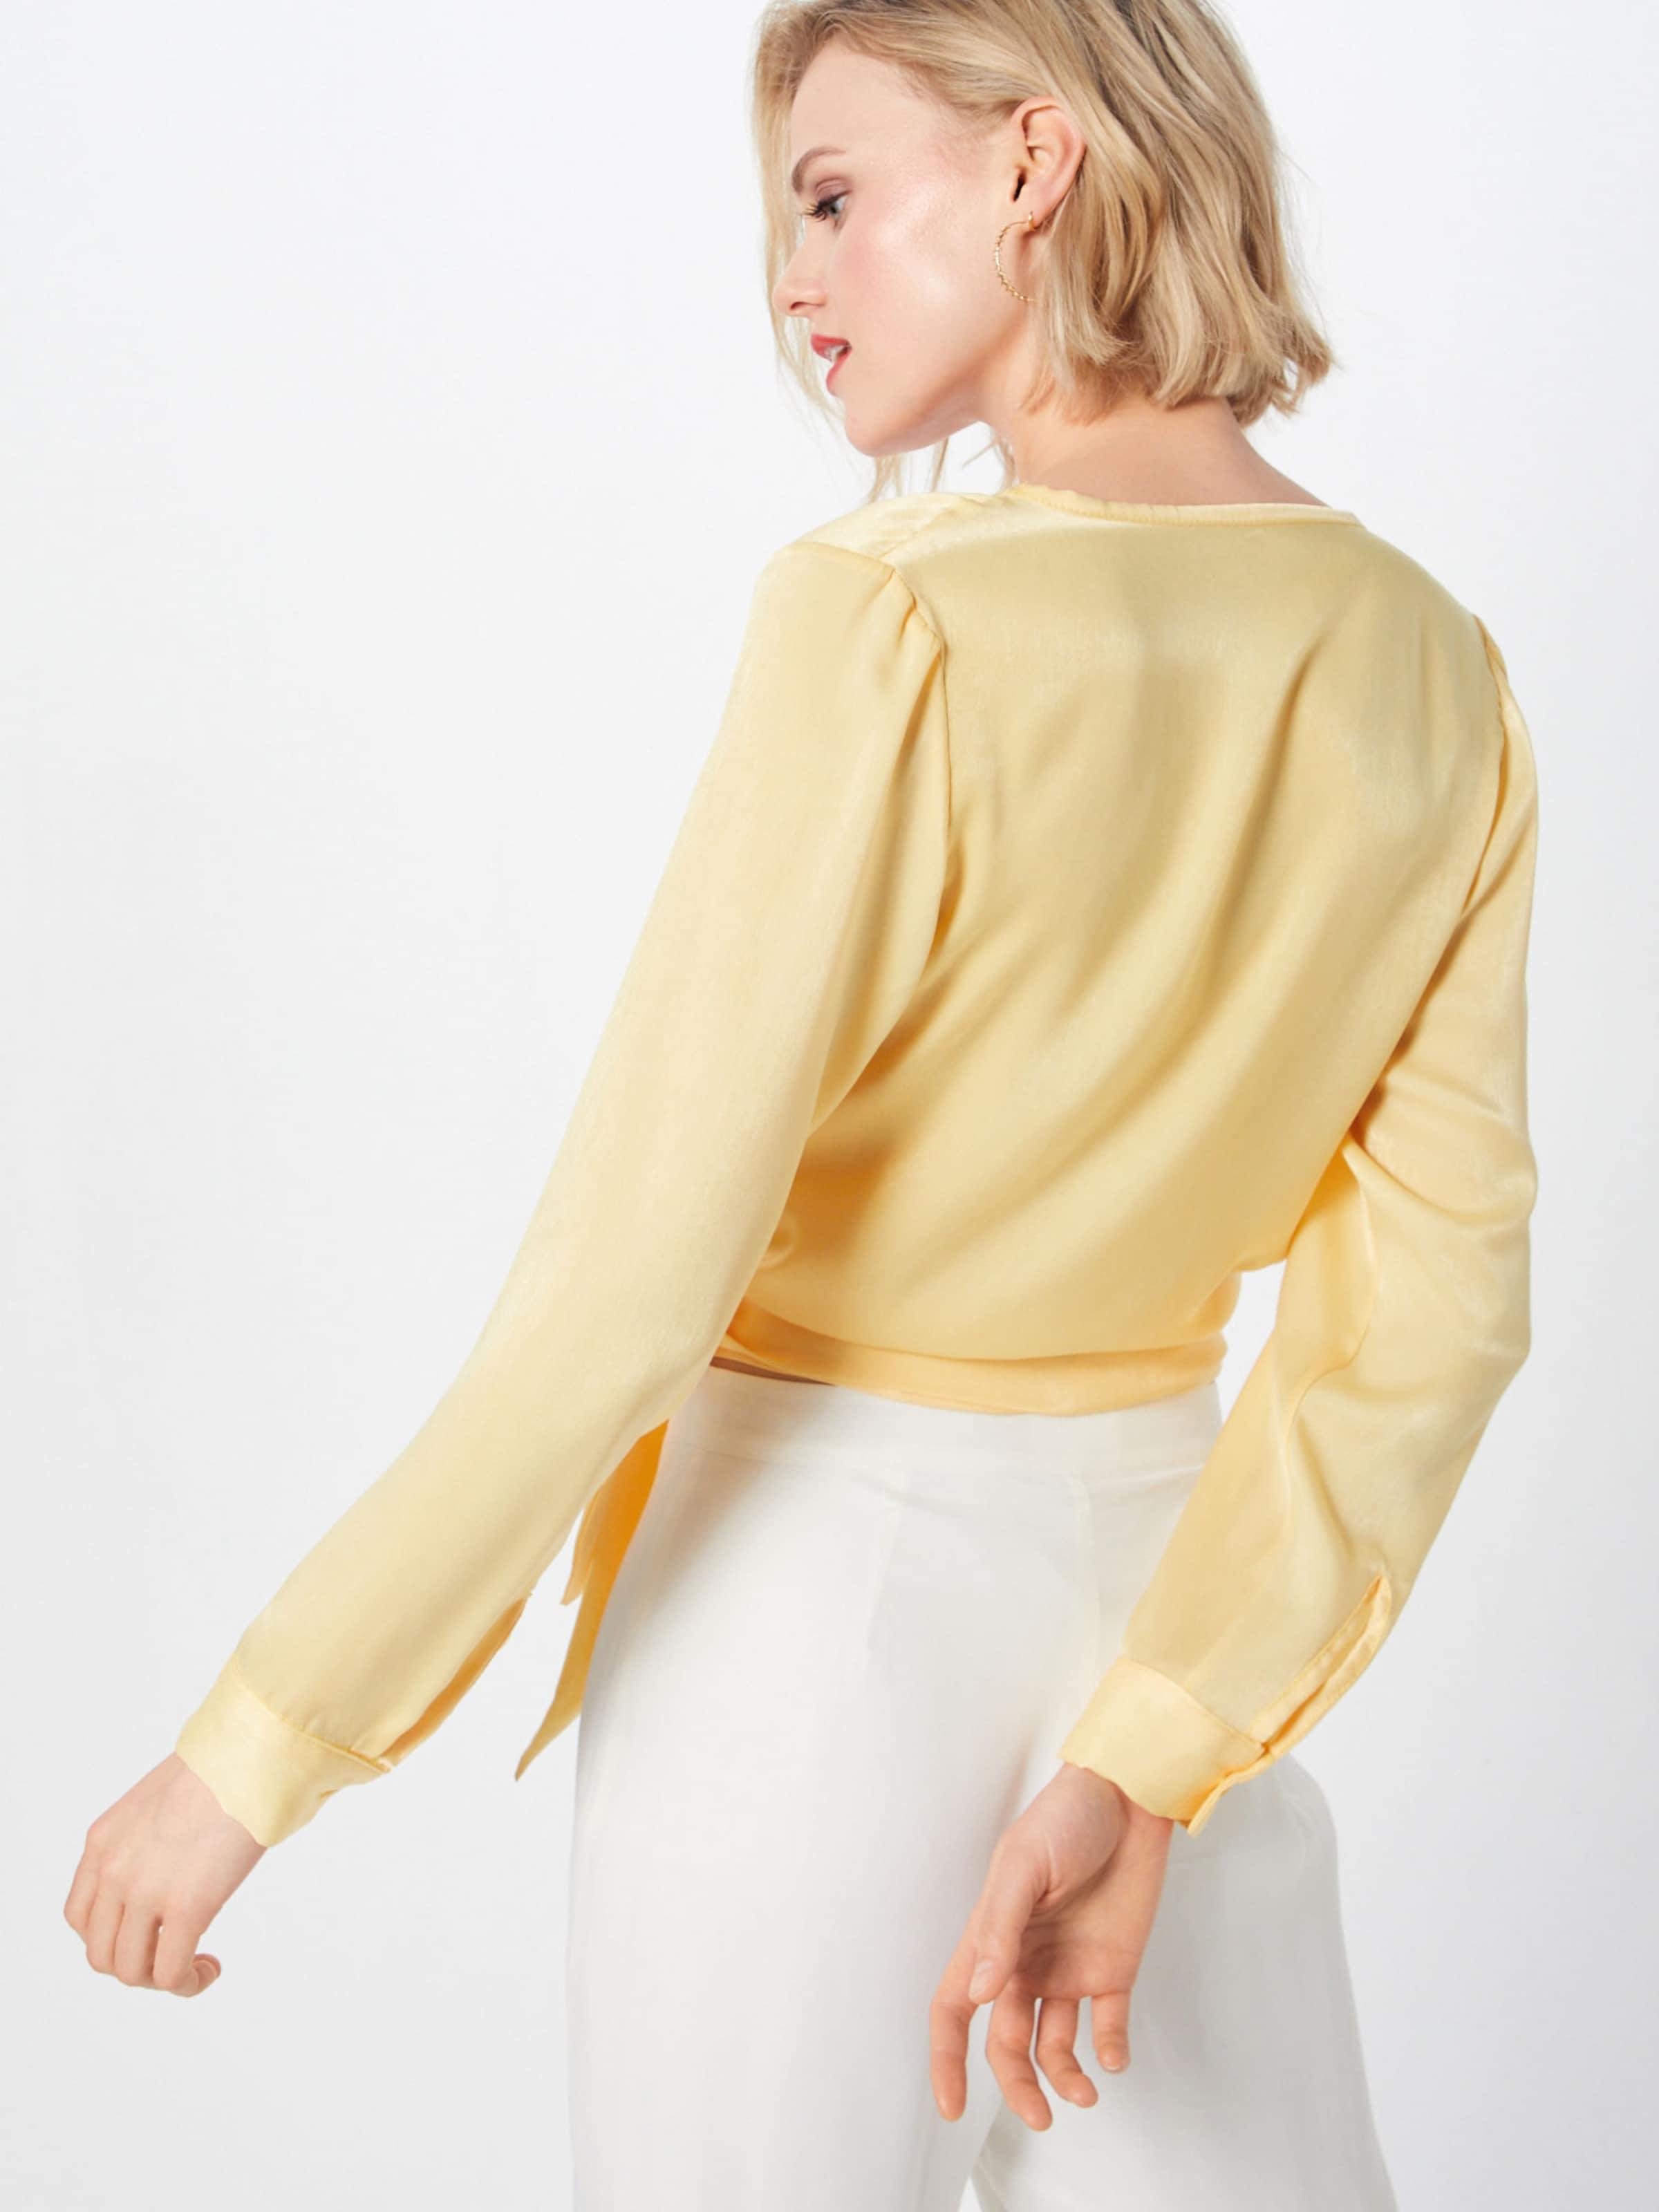 Leger In Bluse Gelb Gercke Lena By 'tilda' vmNy0O8nwP